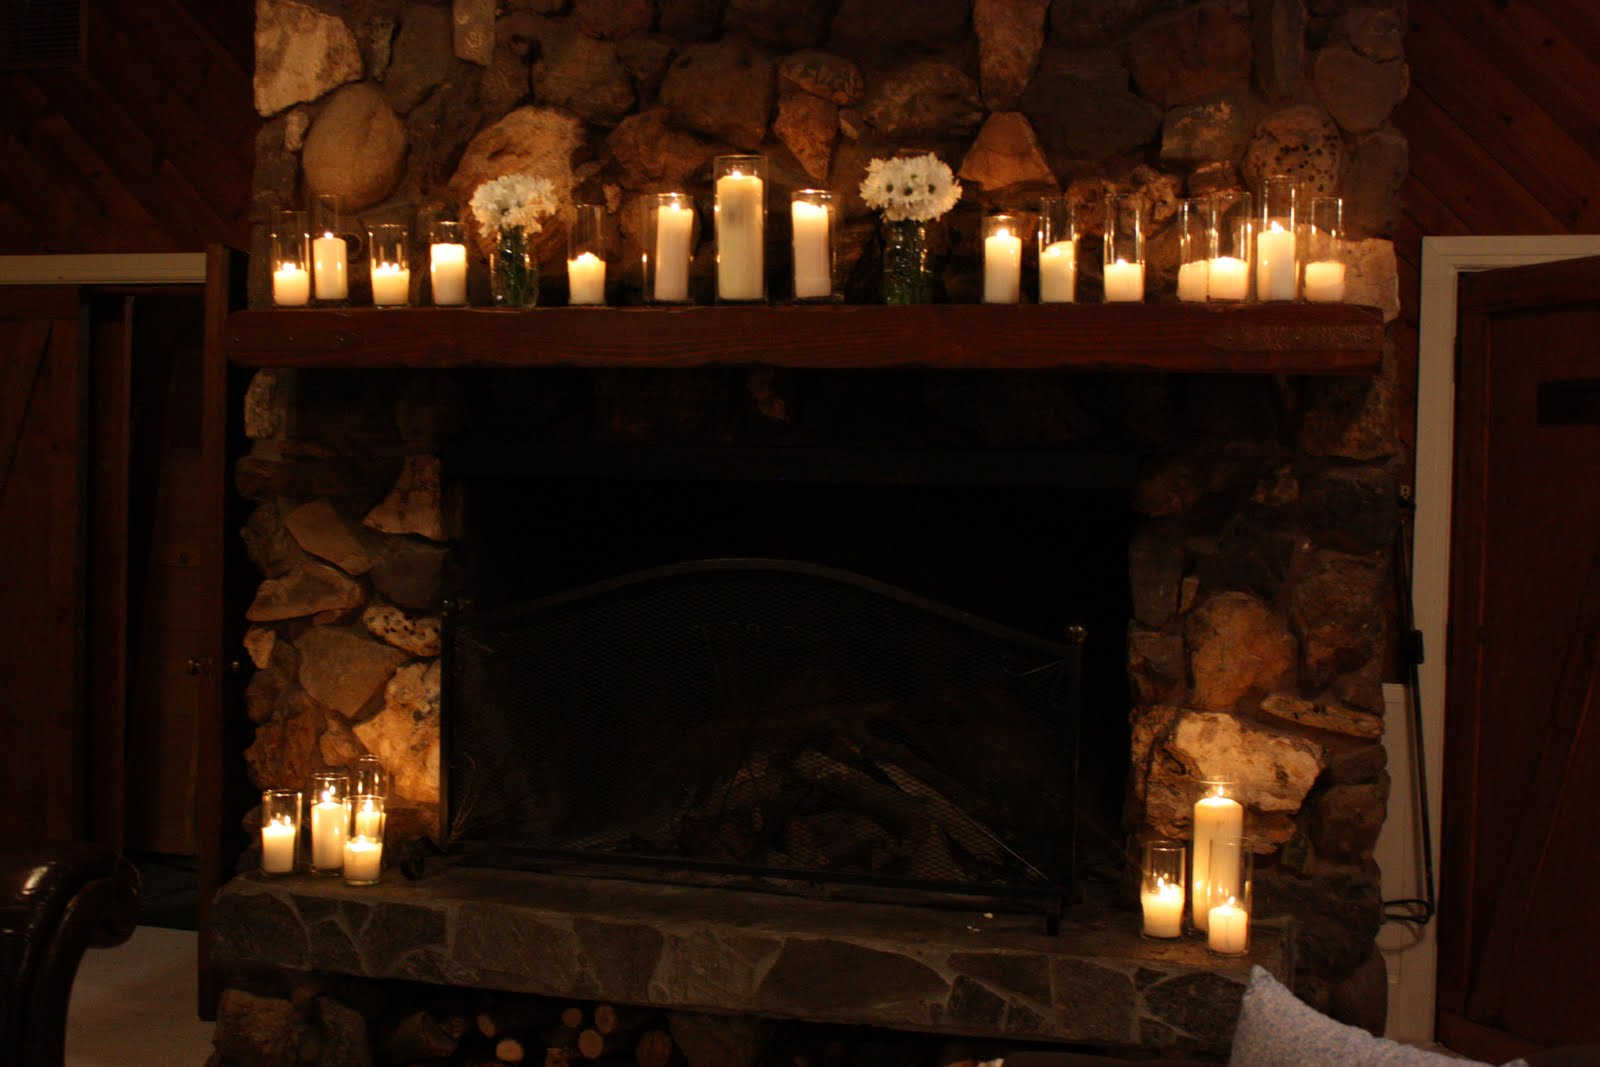 Fire Place Fireplaces Living Room Dean O Gorman